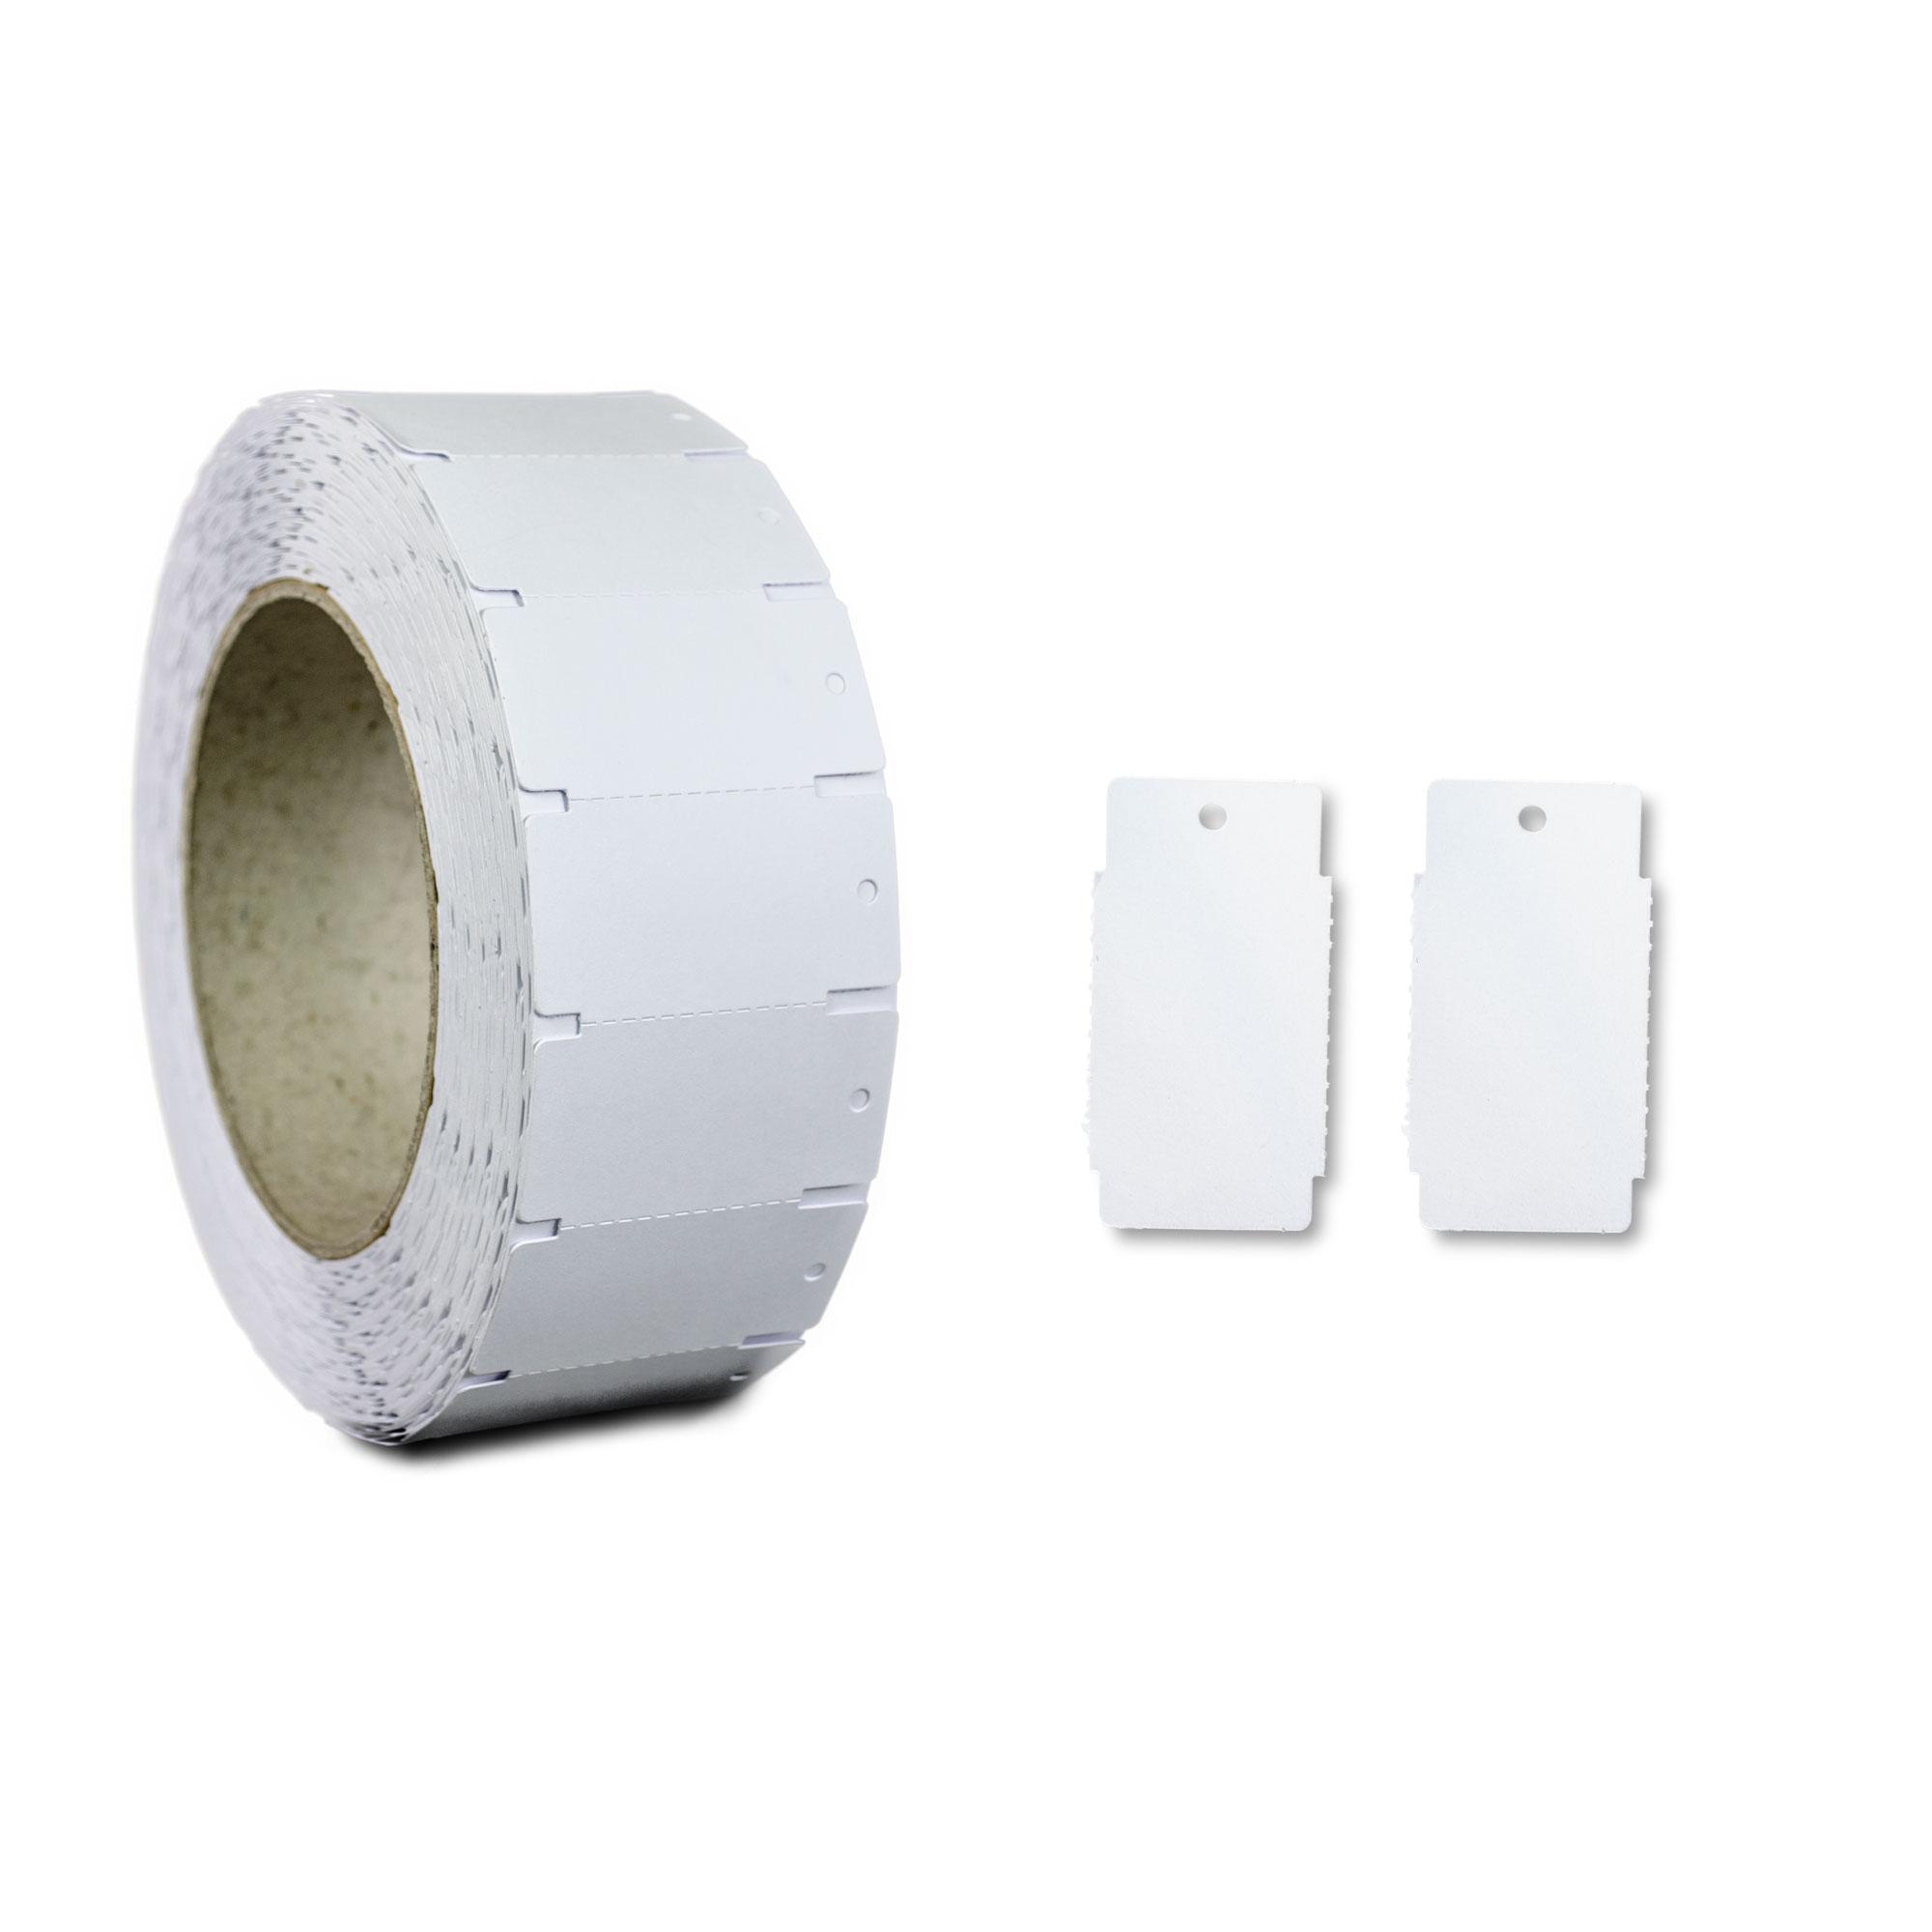 1.000 Kartonetiketten 45x55 mm wei/ß unbedruckt HUTNER H/ängeetiketten Preisschilder einzeln geschnitten